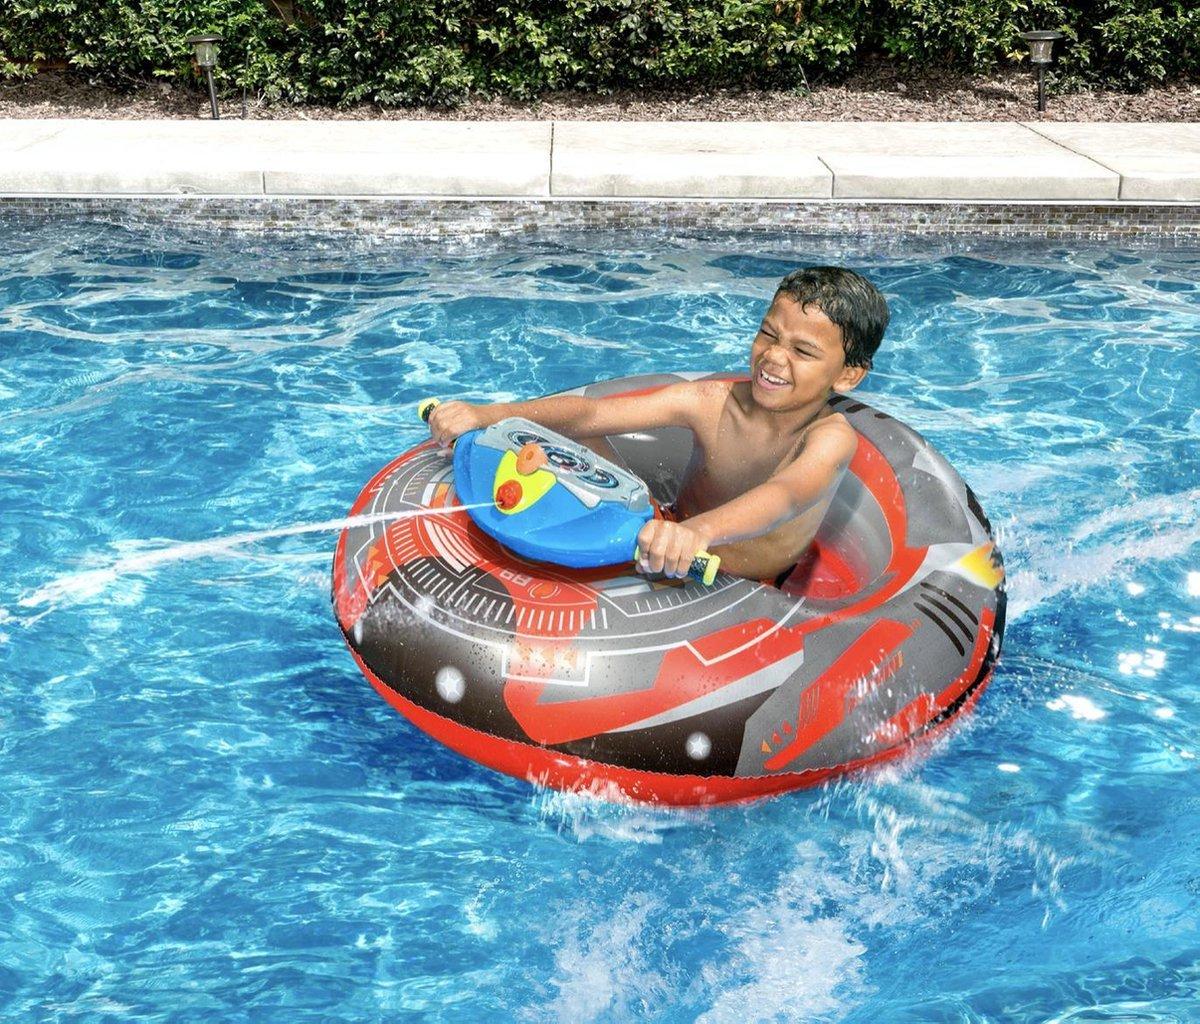 Motorized Bumper Boat - Opblaasbare botsauto + Waterpistool - luchtbed - Intex - waterspeelgoed - opblaasbaar - zwembad - opblaasfiguur kopen